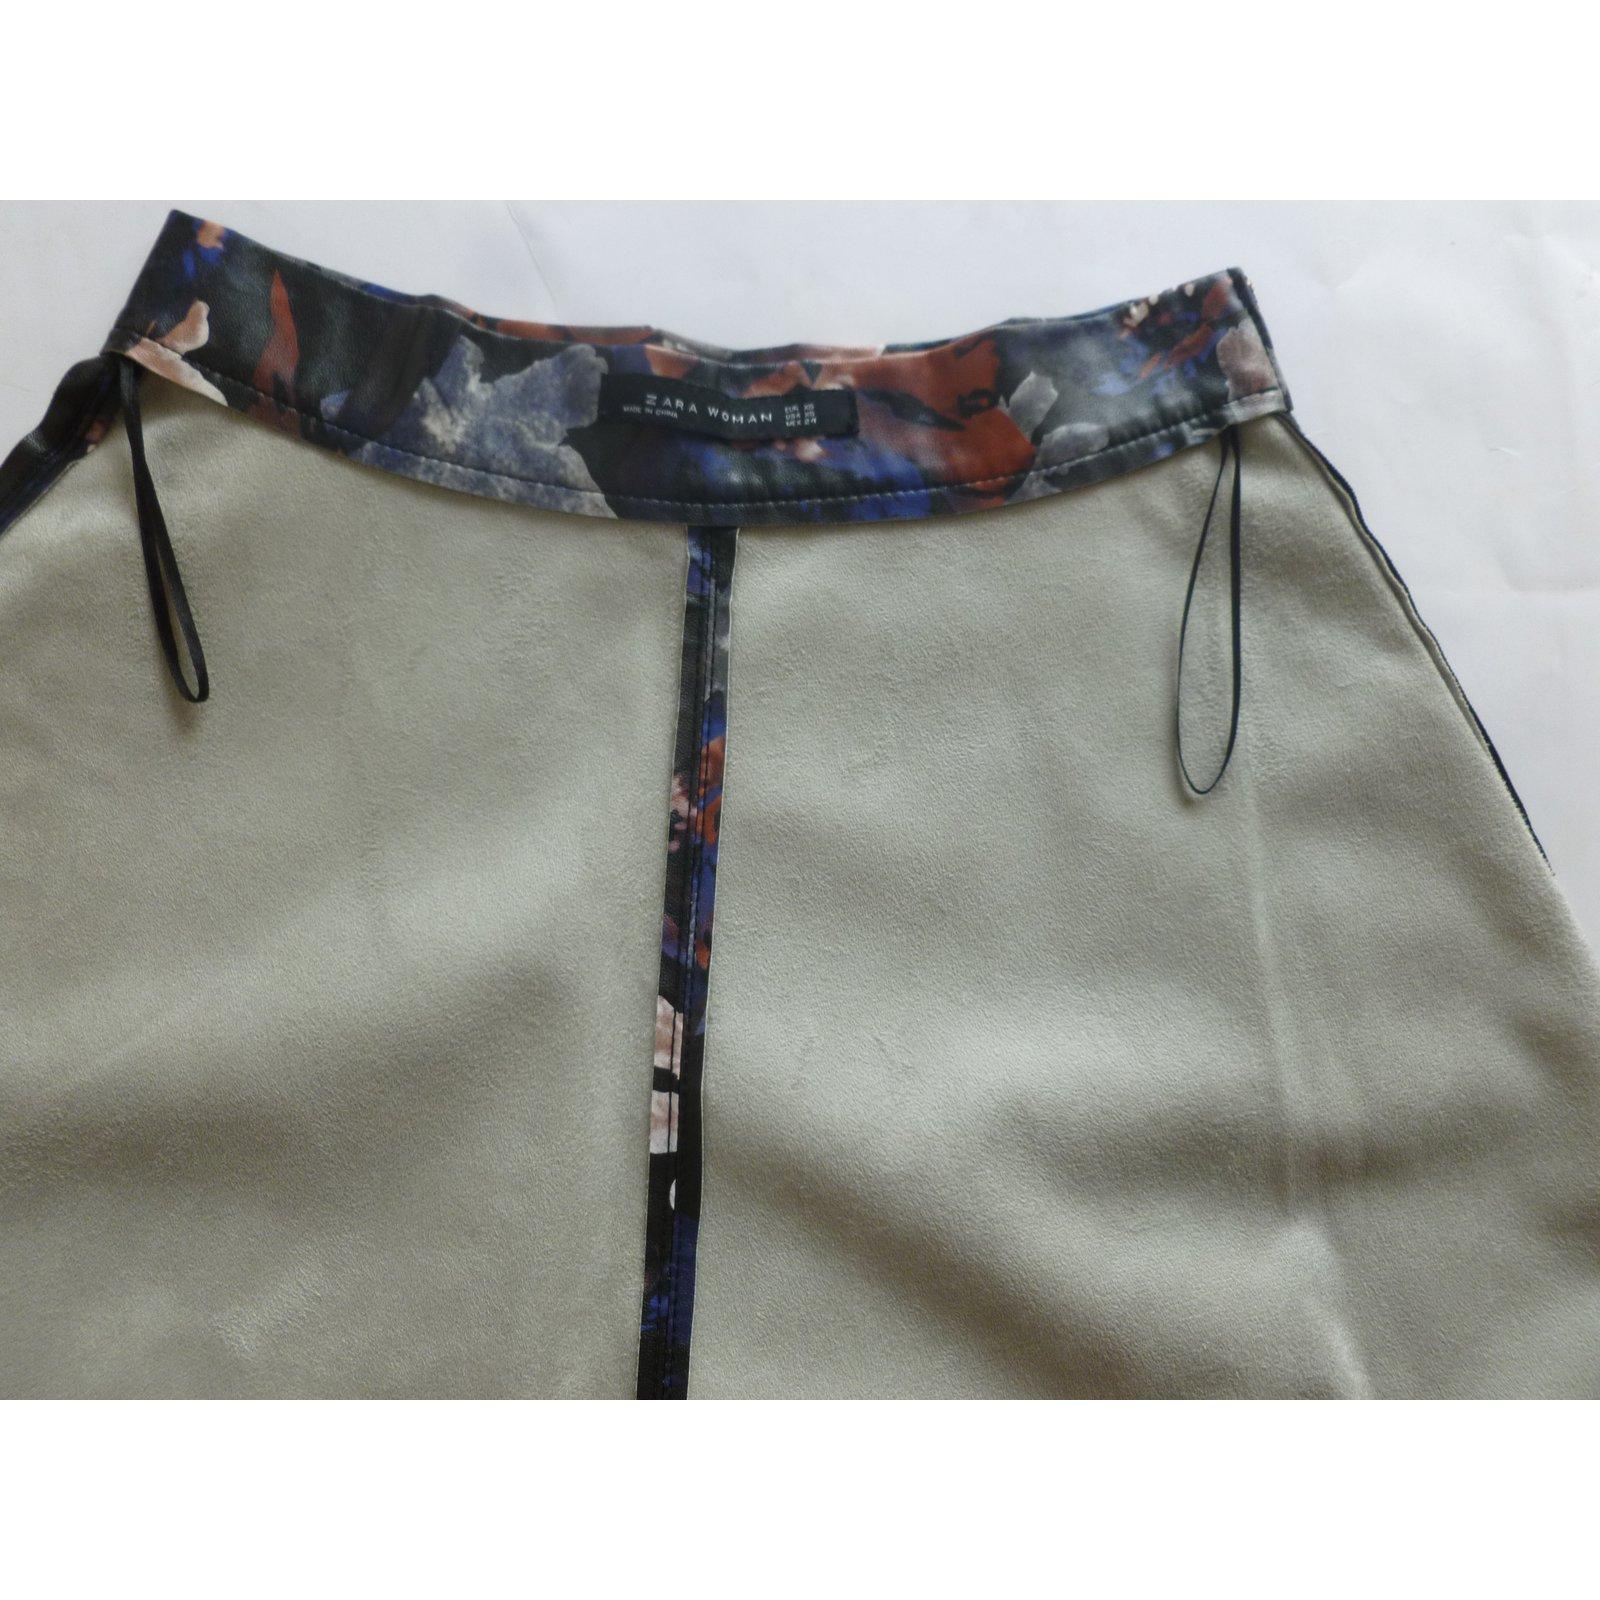 ee66e5d4df Zara Faux leather midi skirt Skirts Other Multiple colors ref.80499 - Joli  Closet